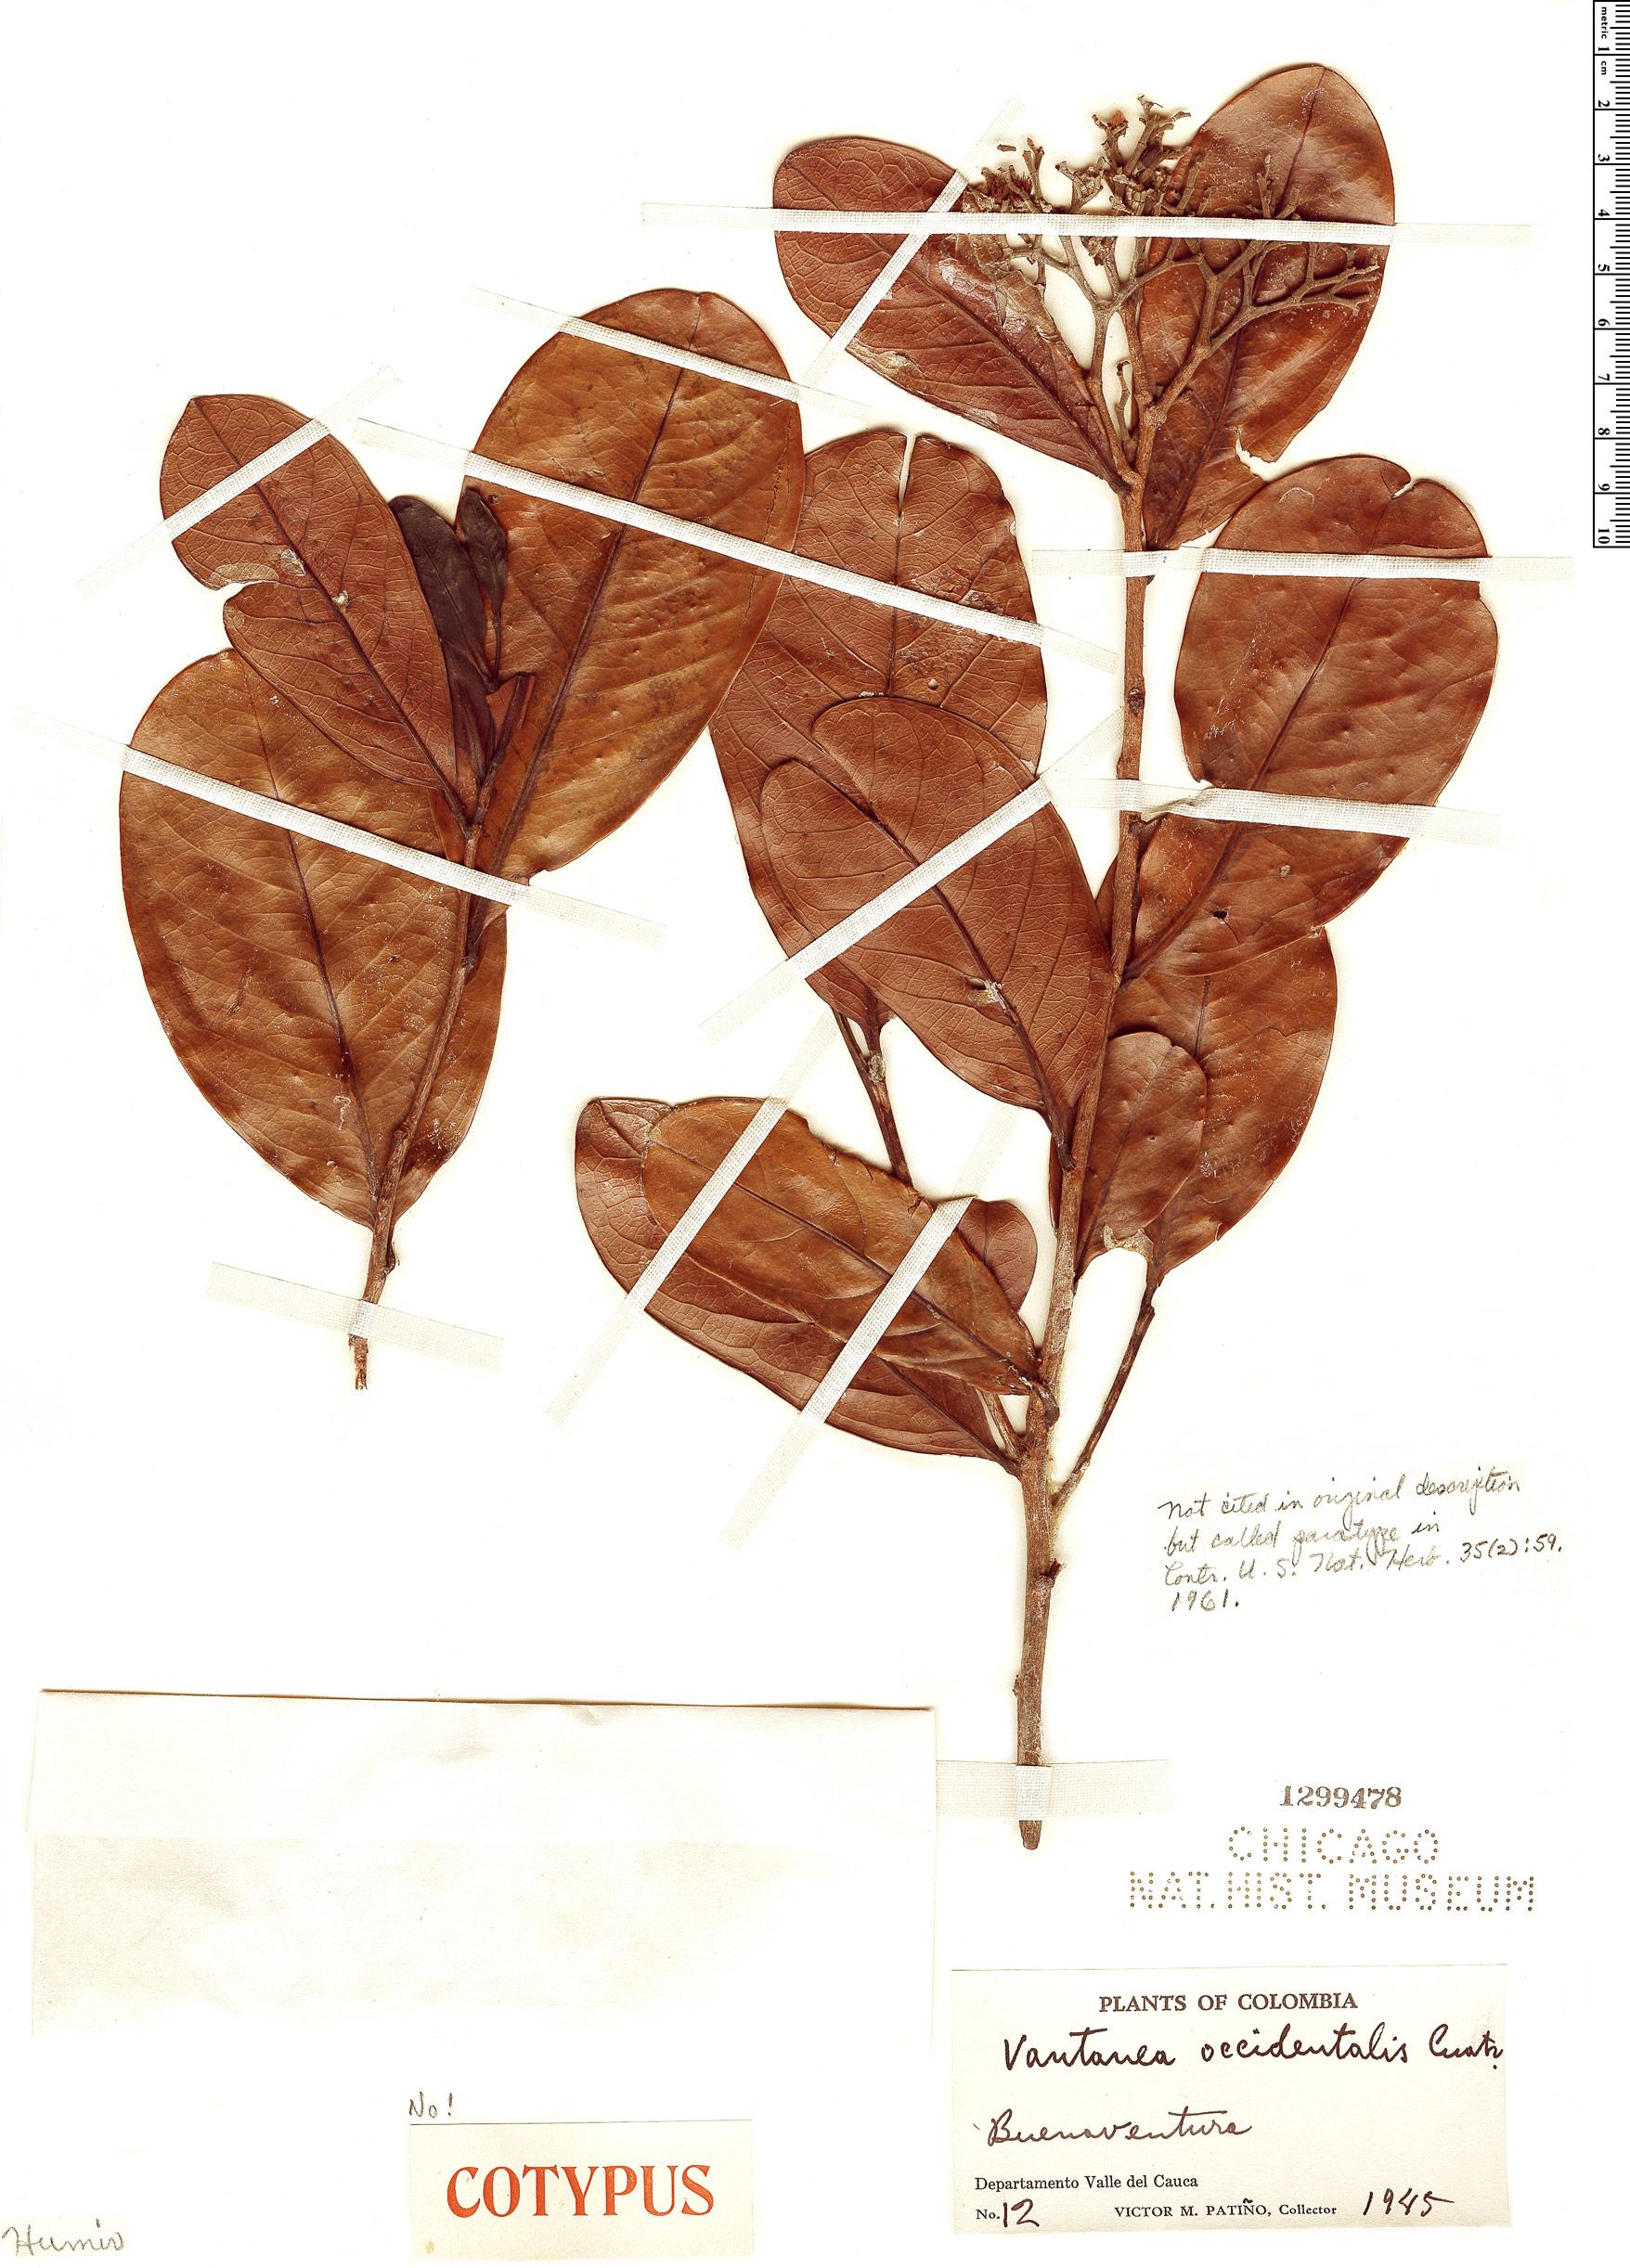 Specimen: Vantanea occidentalis